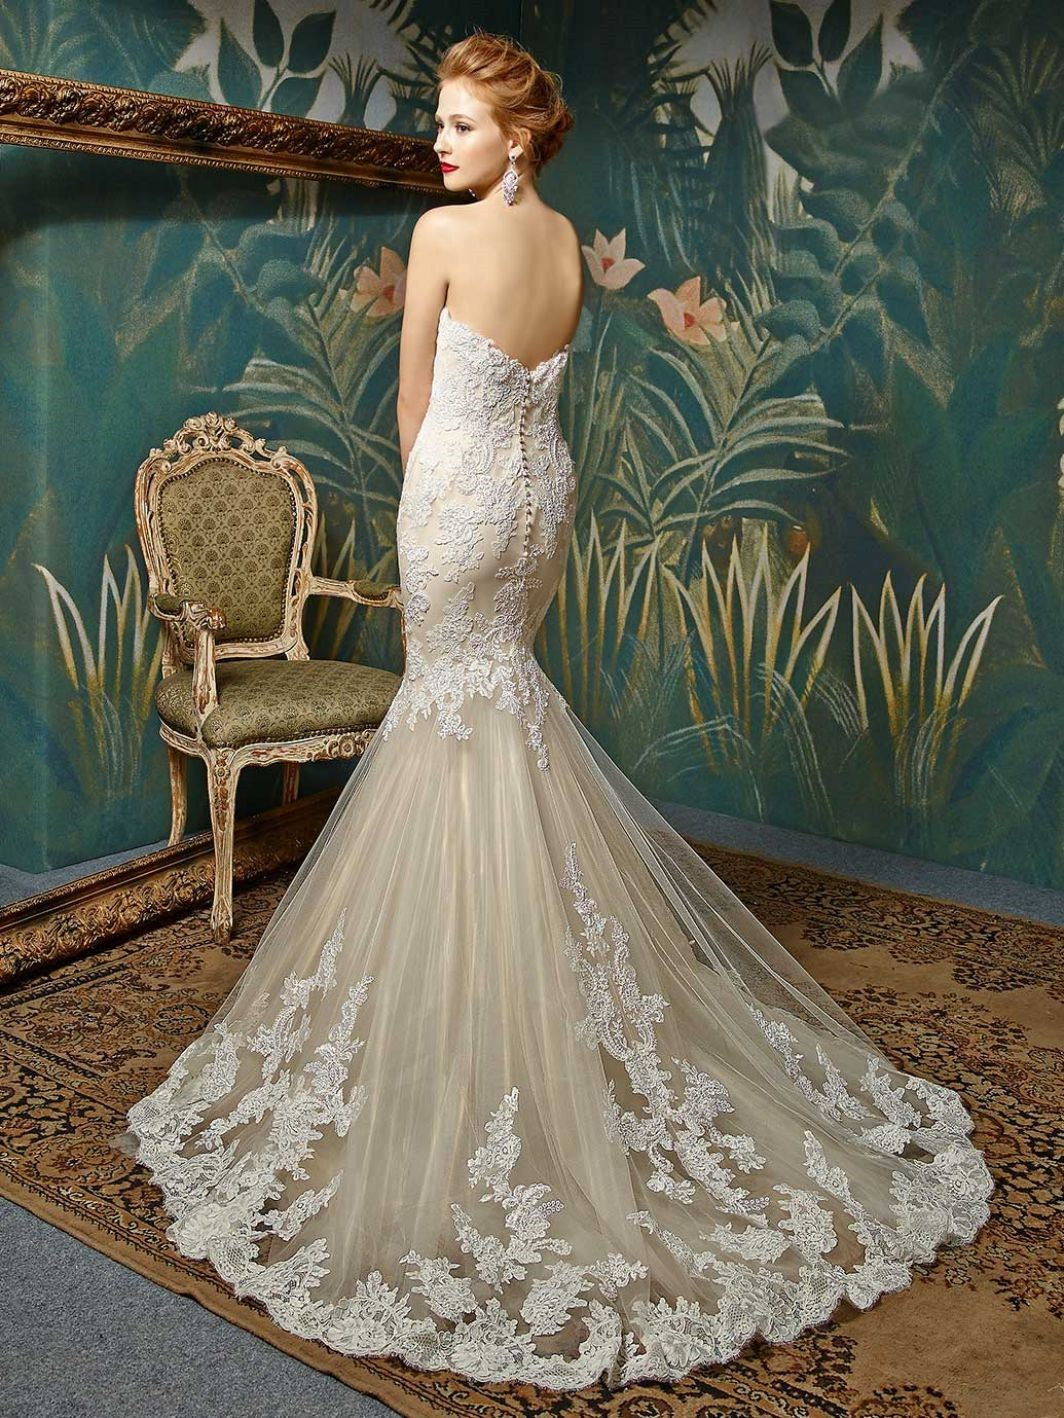 Blue By Enzoani   New Wedding Dress   Wedding dress hire, Wedding ...